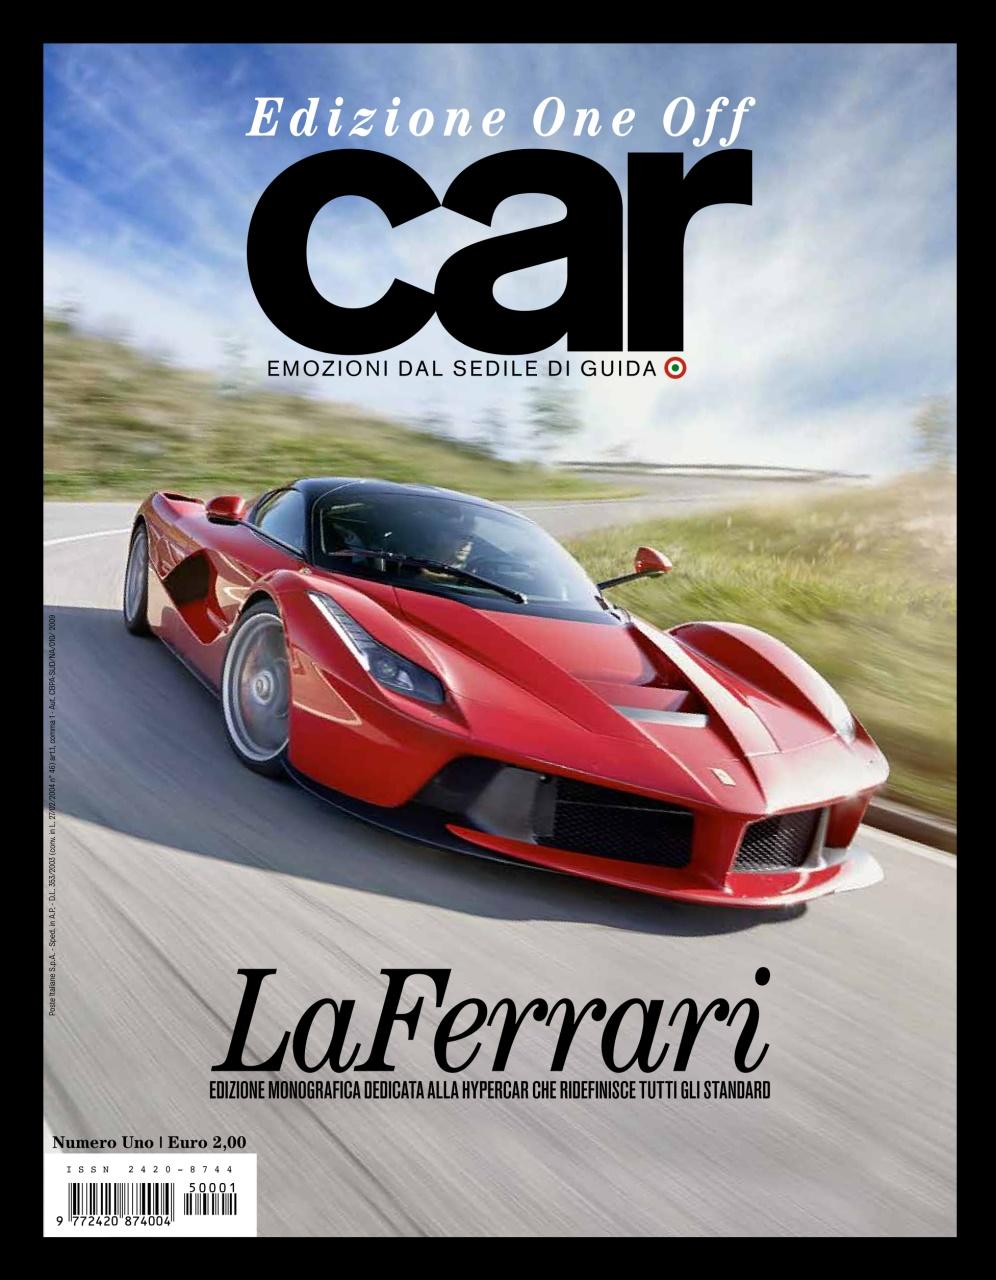 car magazine italia car edizione one off laferrari subscriptions pocketmags. Black Bedroom Furniture Sets. Home Design Ideas